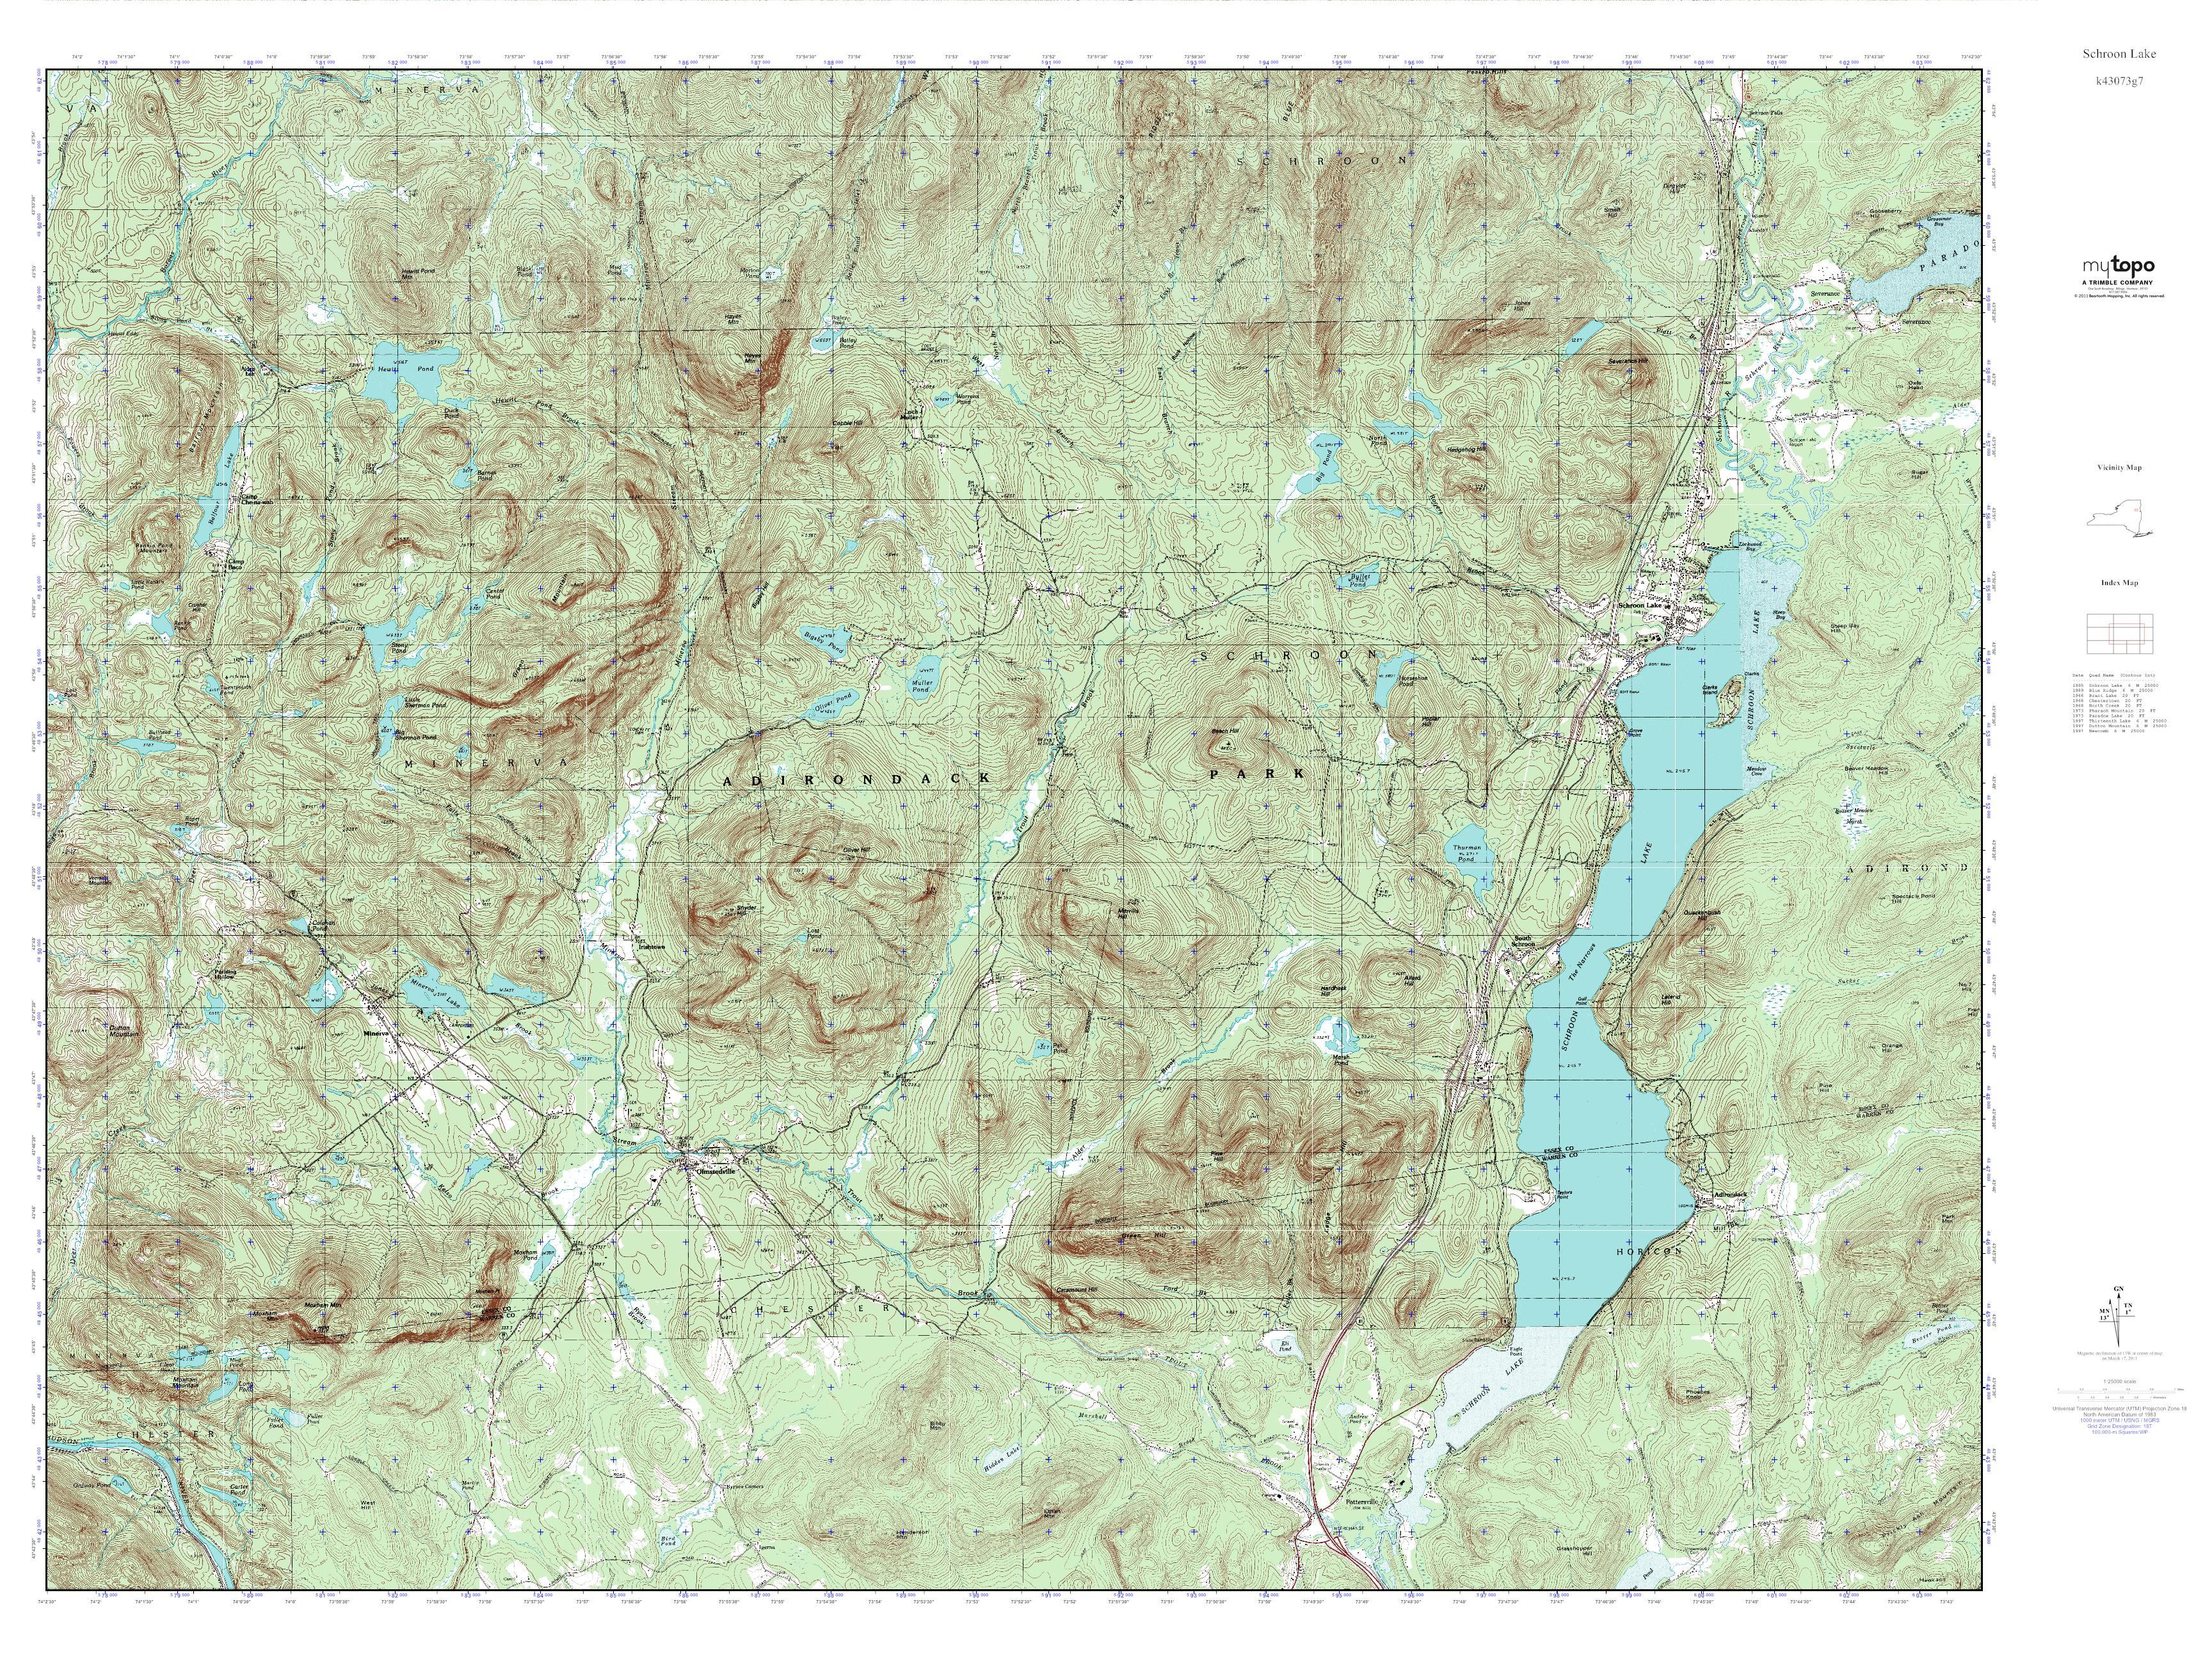 Mytopo Schroon Lake New York Usgs Quad Topo Map